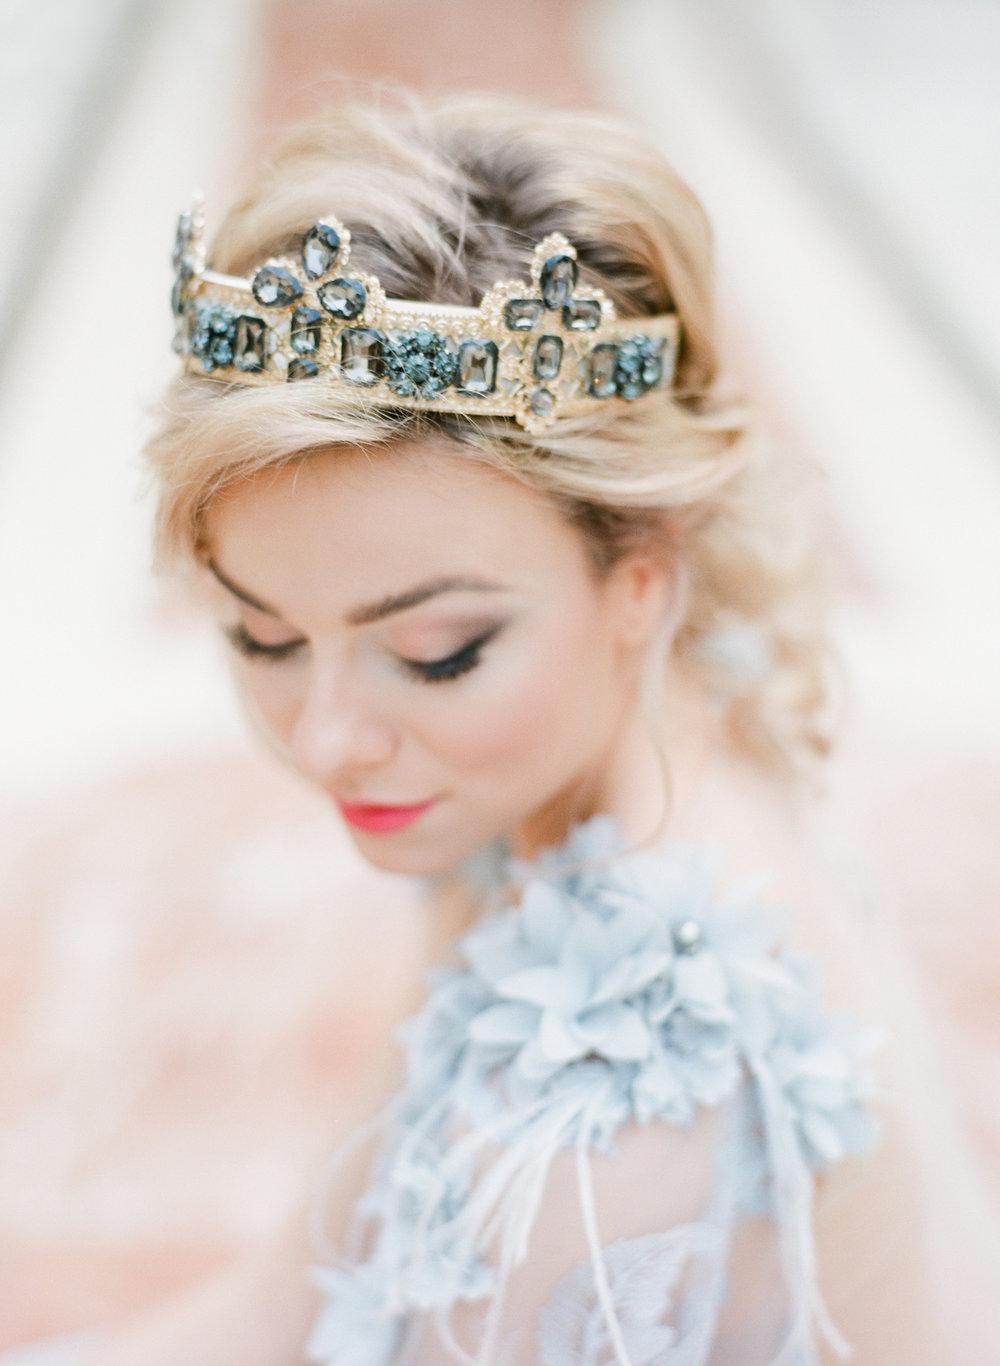 galicia_nueva_wedding_egitorial_nikol_bodnarova_92.JPG